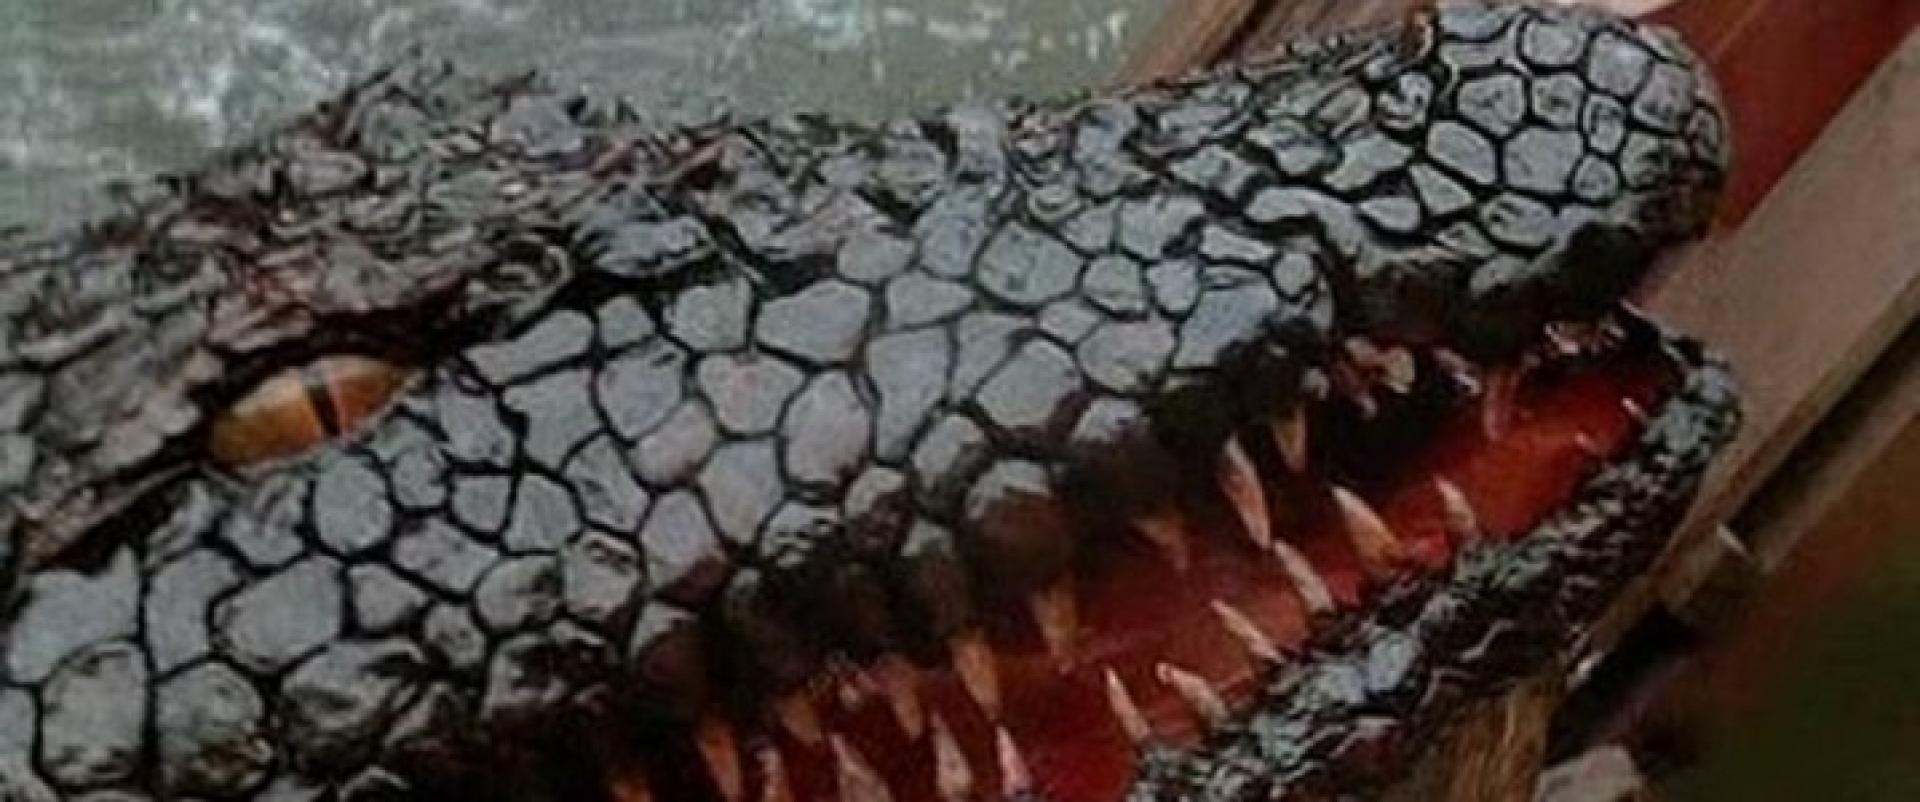 Killer Crocodile 2 - Gyilkos krokodil 2 (1990)